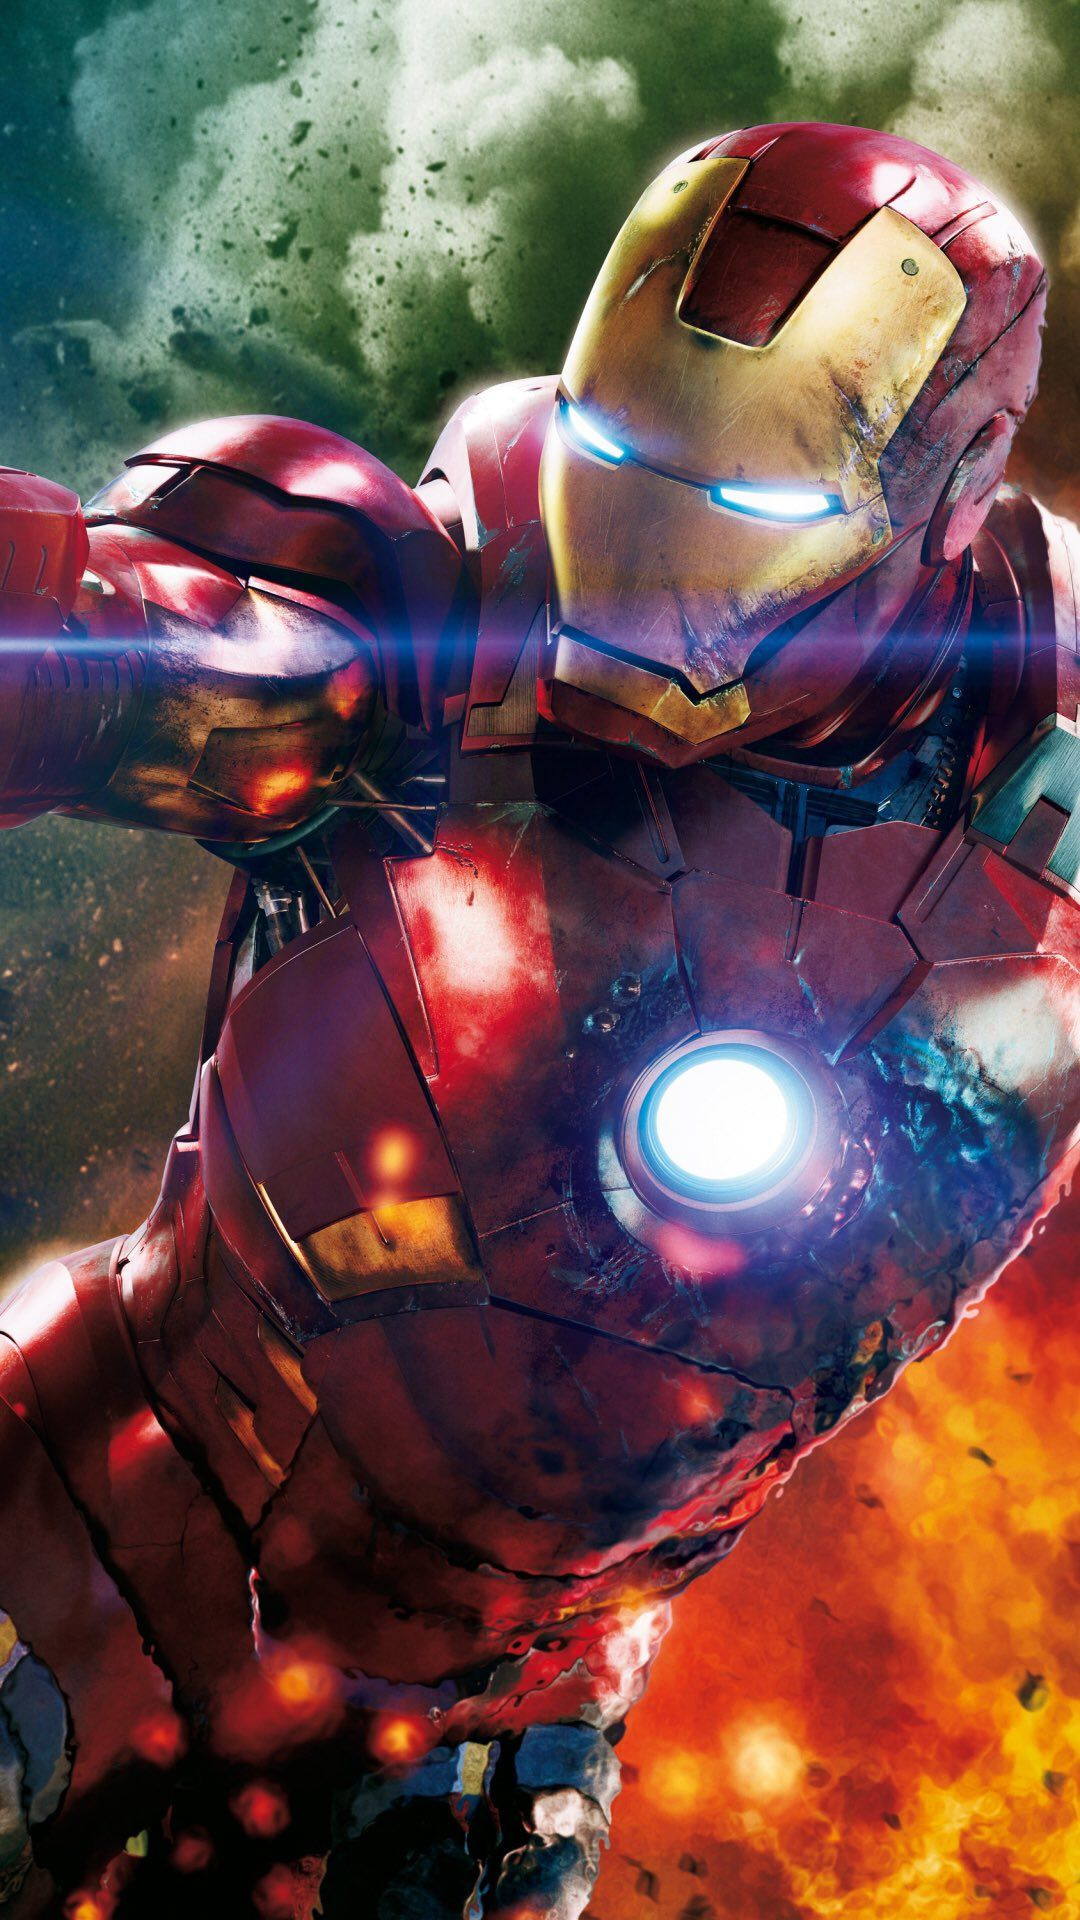 Ironman Https T Co Hfrdfpengx Iron Man Wallpaper Avengers Wallpaper Marvel Iron Man